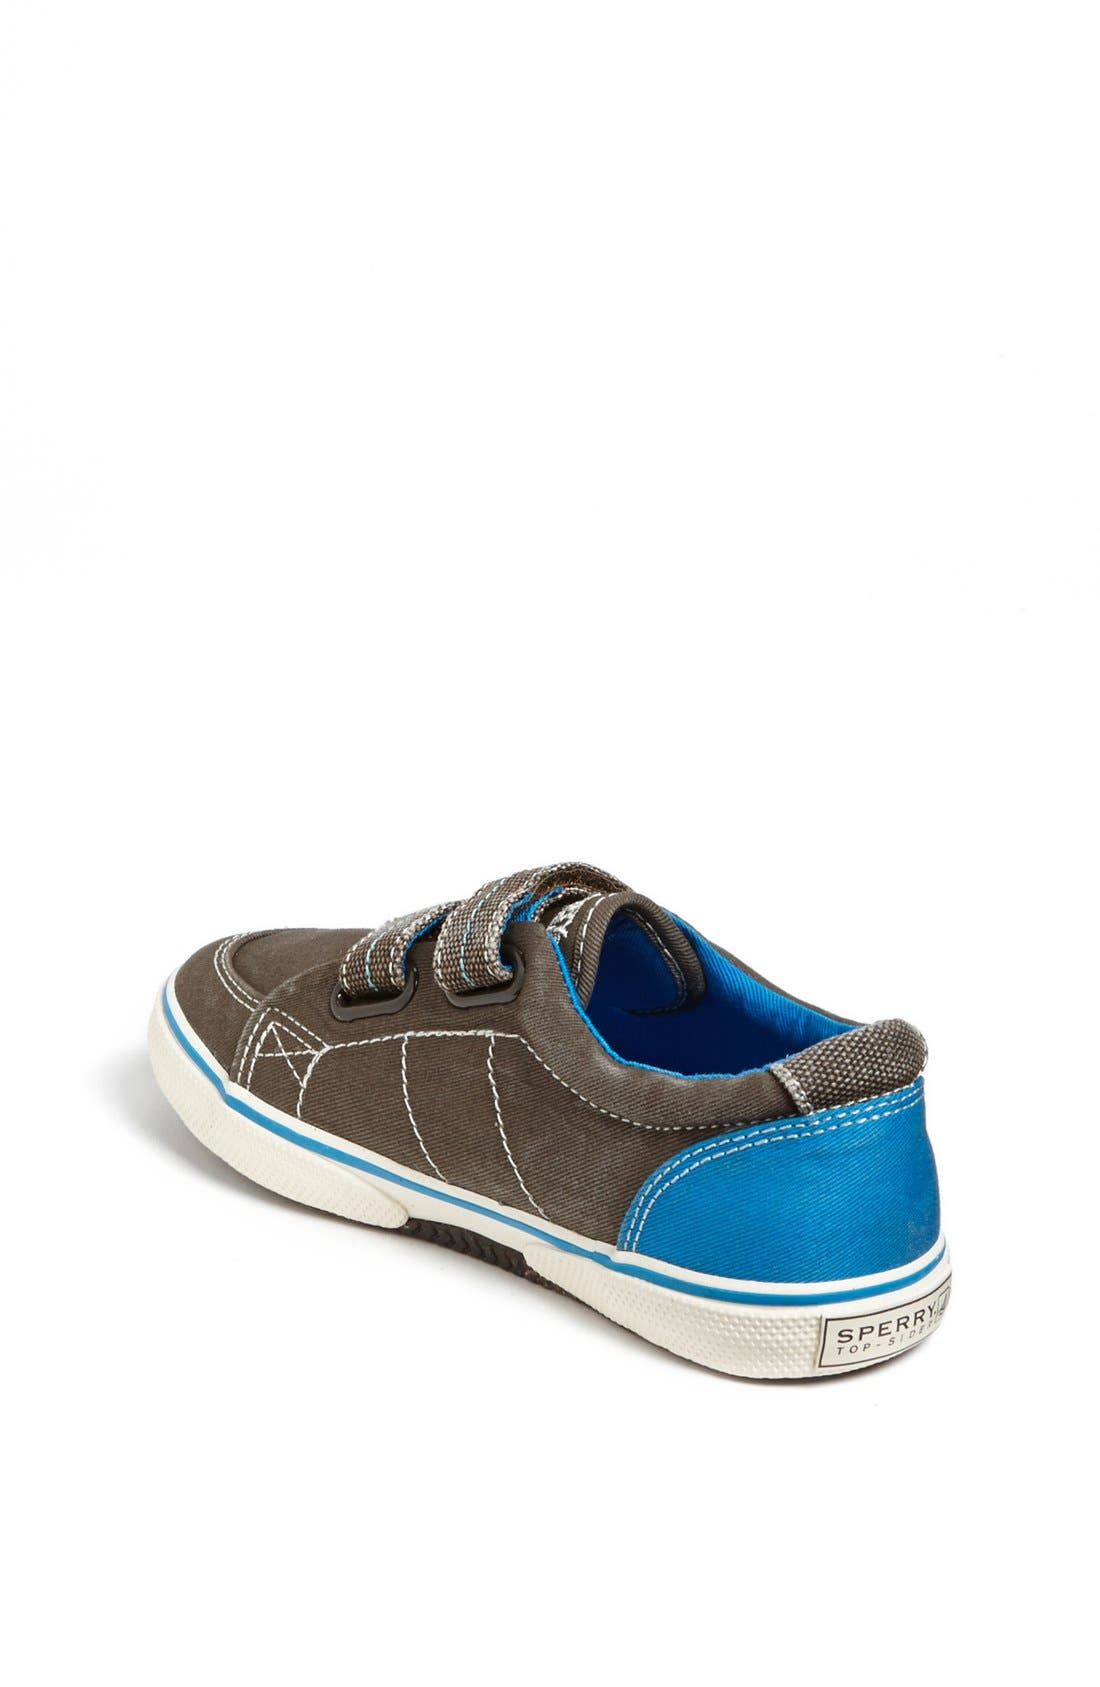 Alternate Image 2  - Sperry Kids 'Halyard' Sneaker (Walker & Toddler)